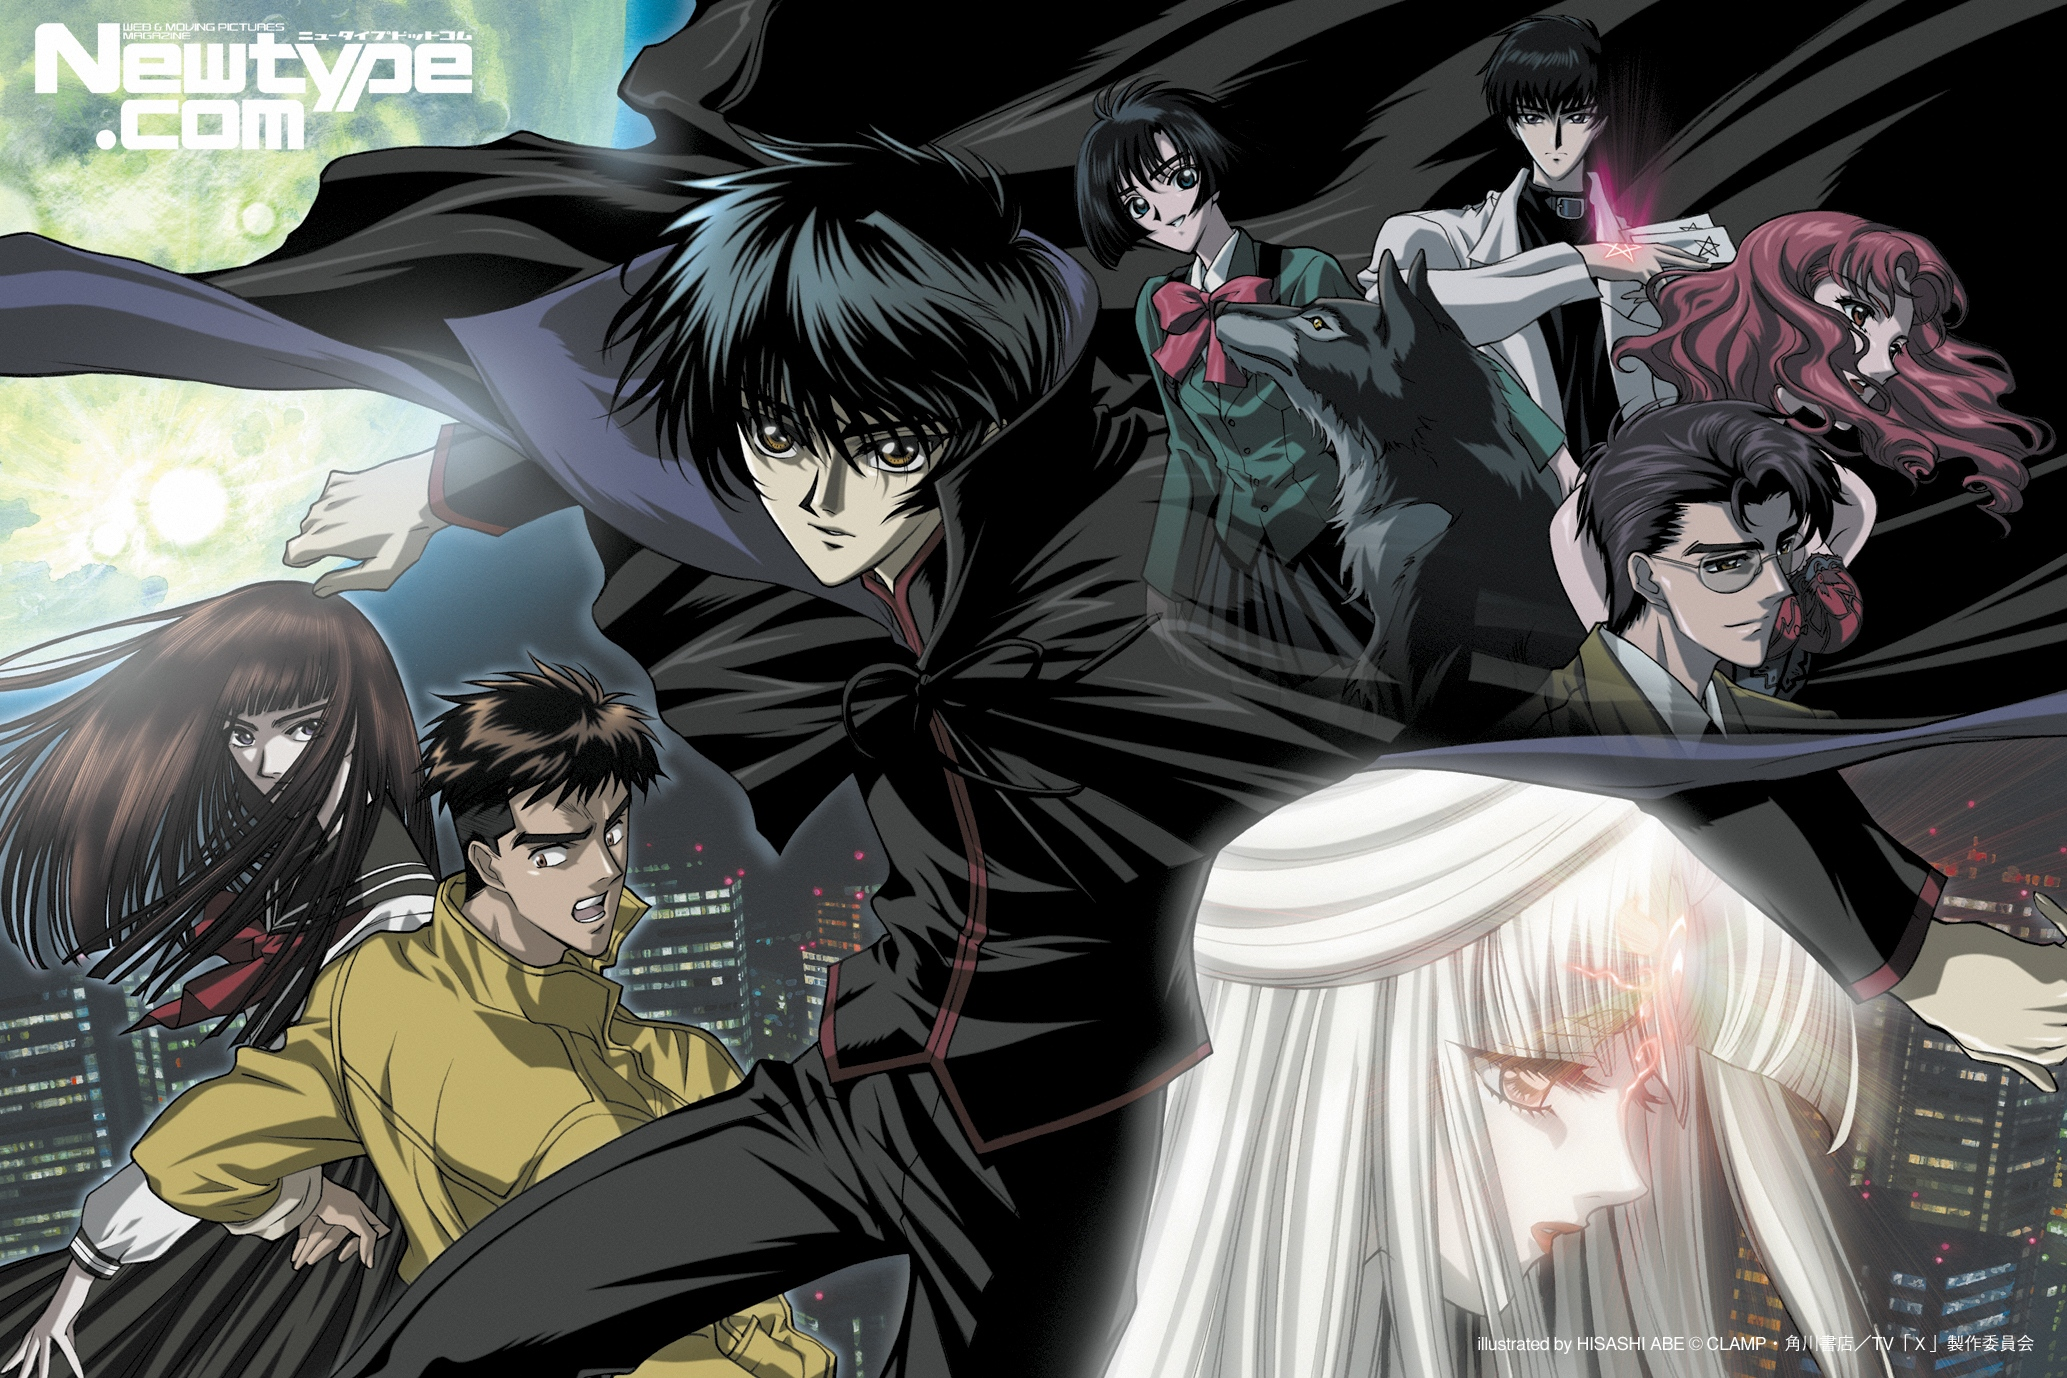 Hinoto x zerochan anime image board for Zerochan anime